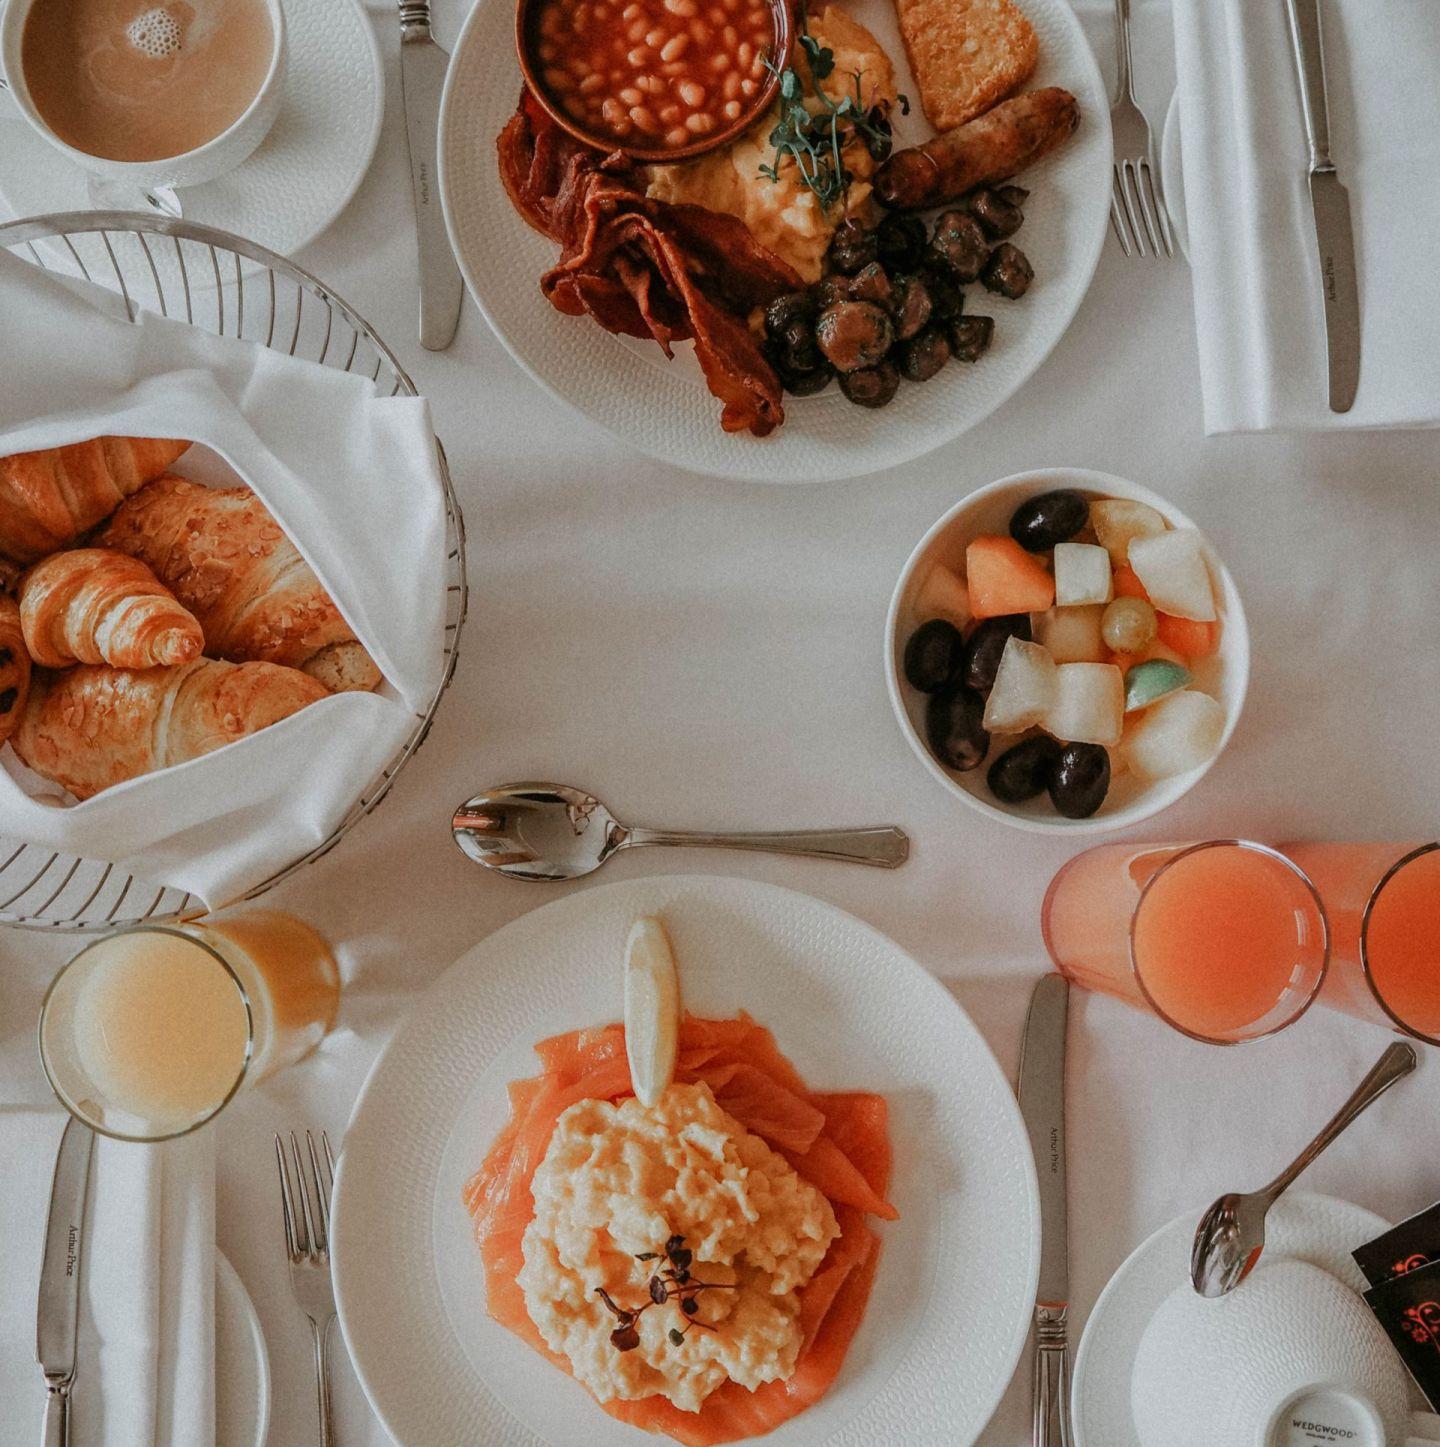 Royal Lancaster Hotel London Kate Winney Breakfast Room Service